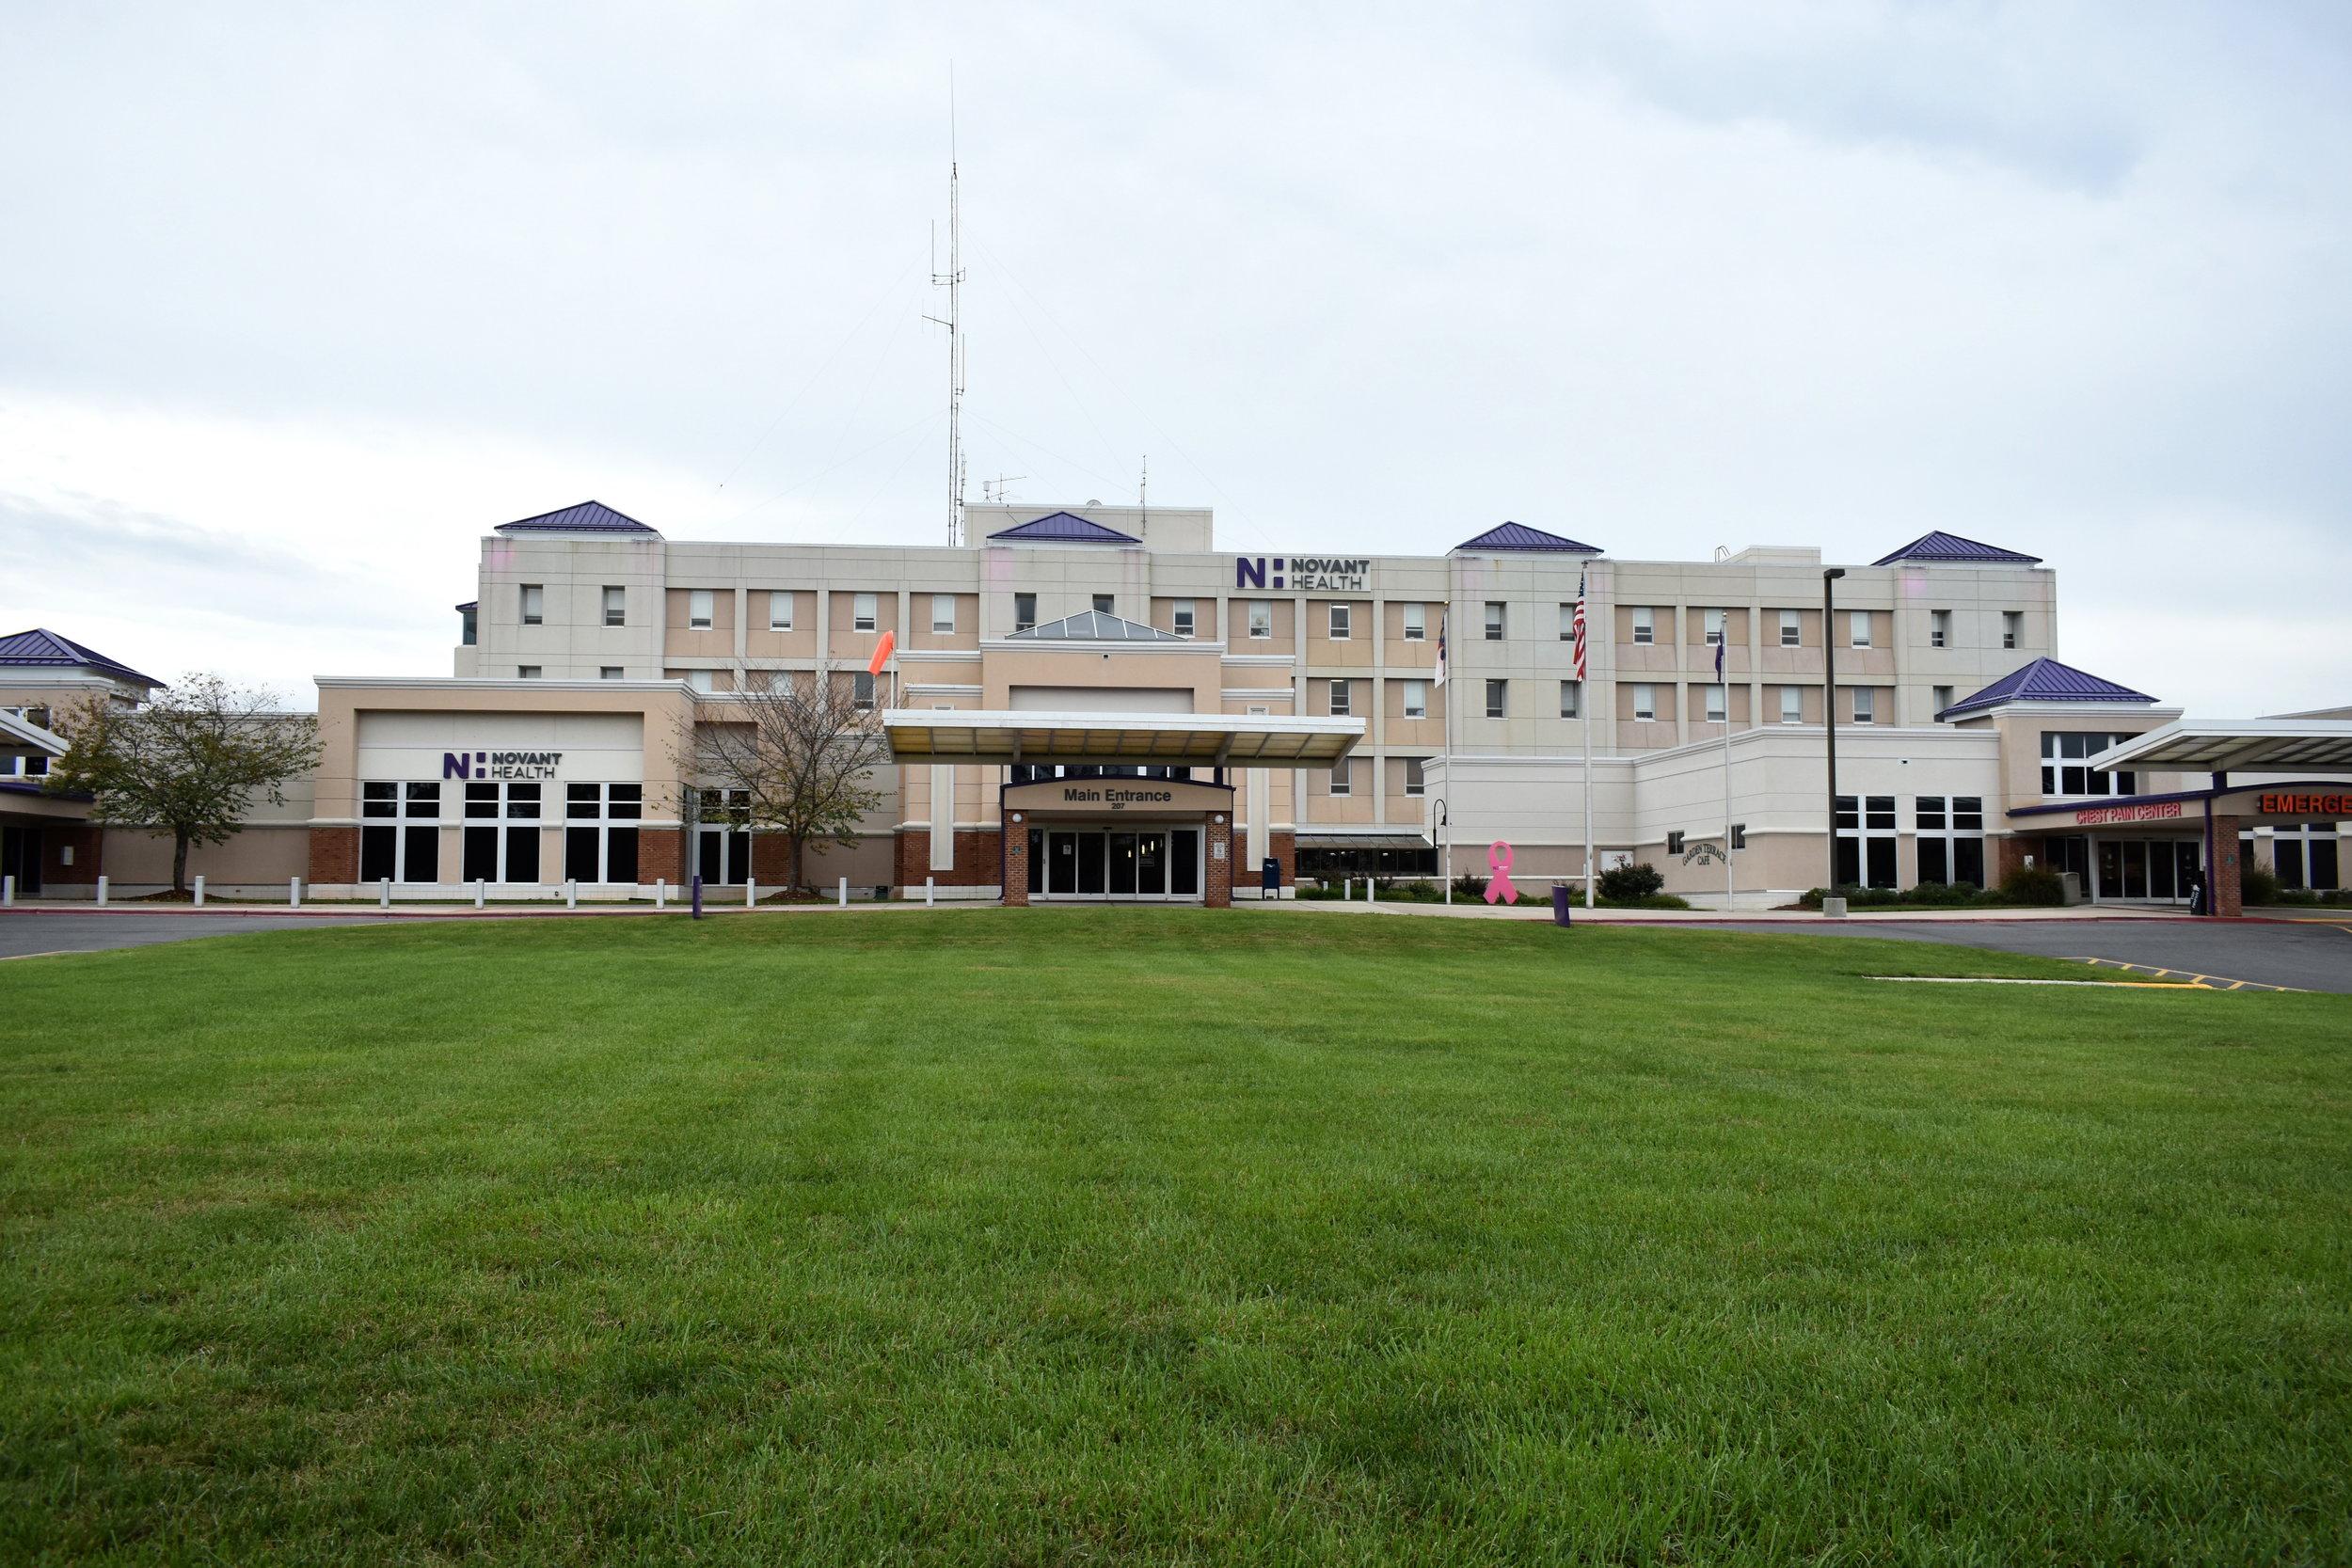 Novant Health Thomasville Medical Center